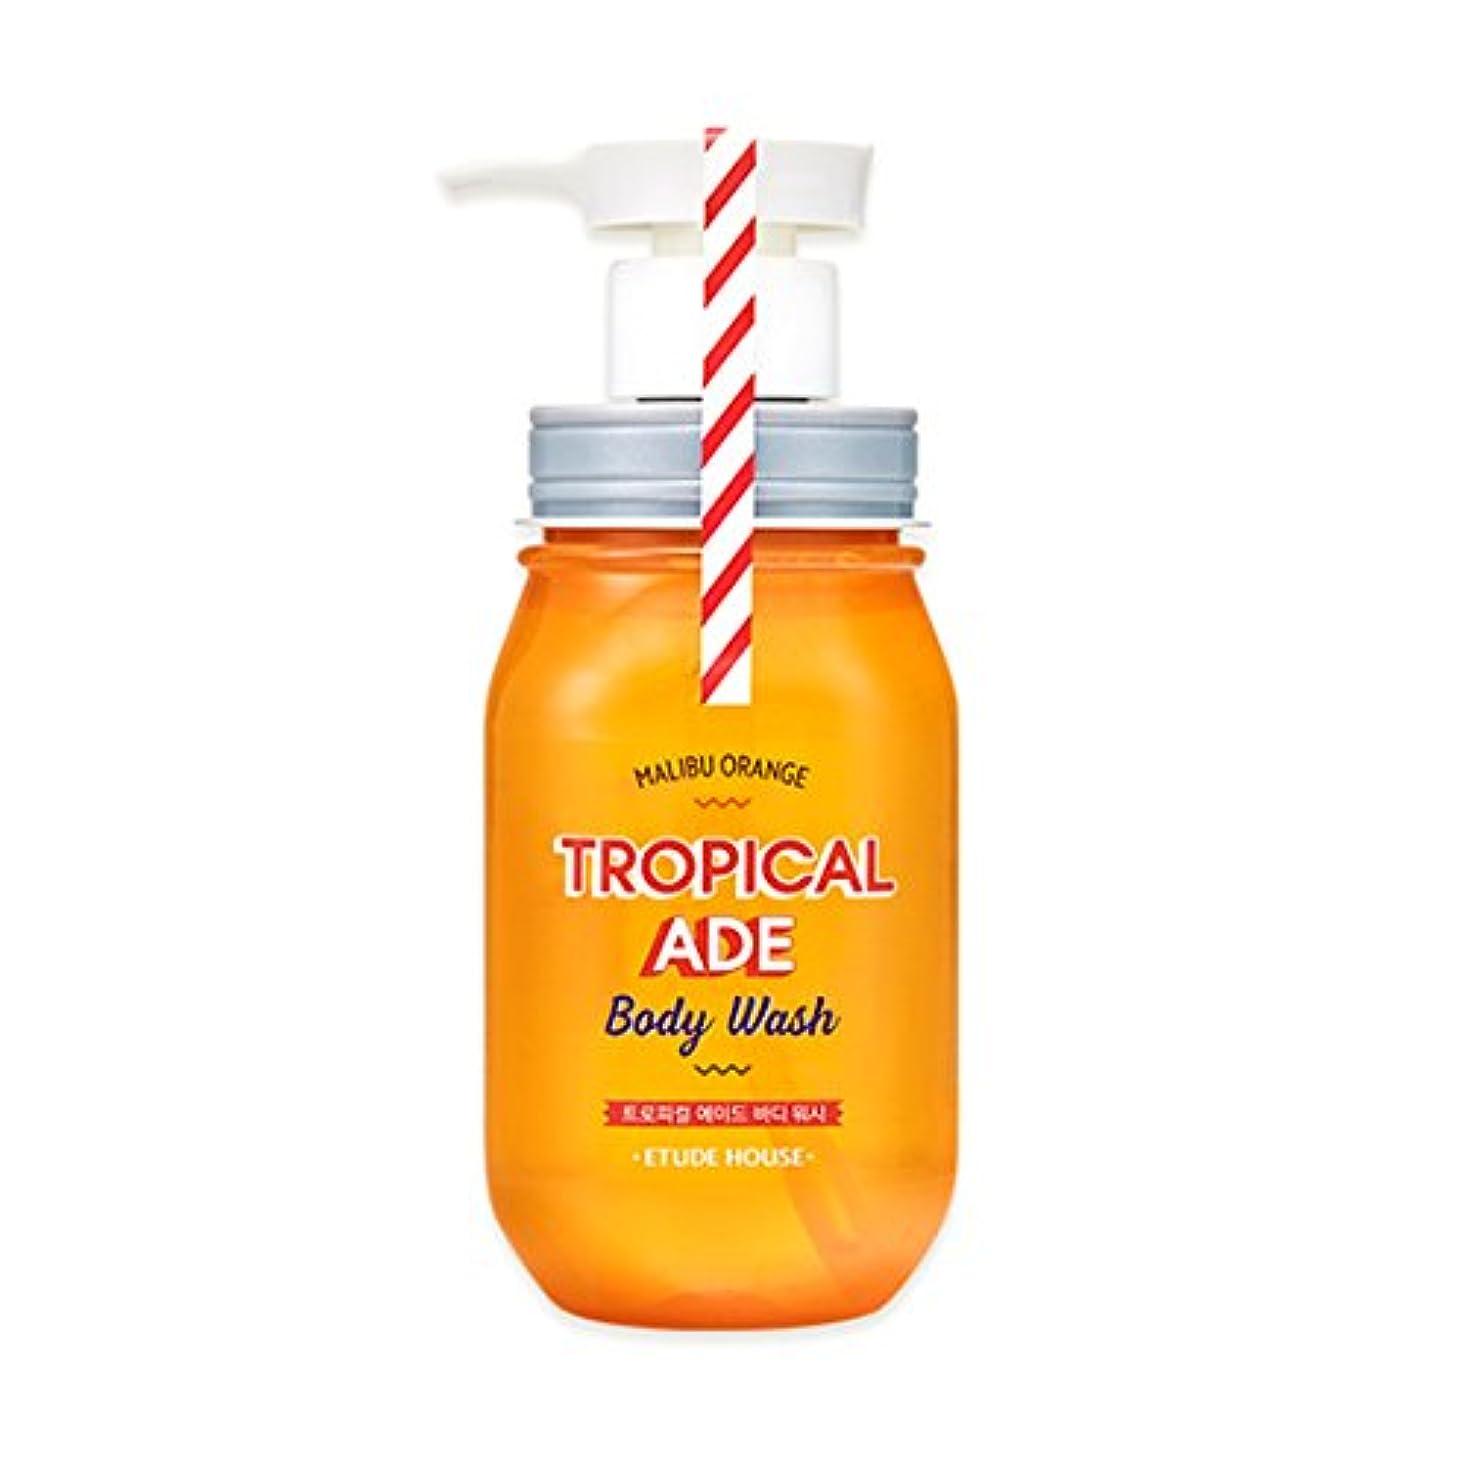 ETUDE HOUSE TROPICAL ADE Body Wash # Malibu Orange /エチュードハウス トロピカルエイドボディウォッシュ 300ml [並行輸入品]